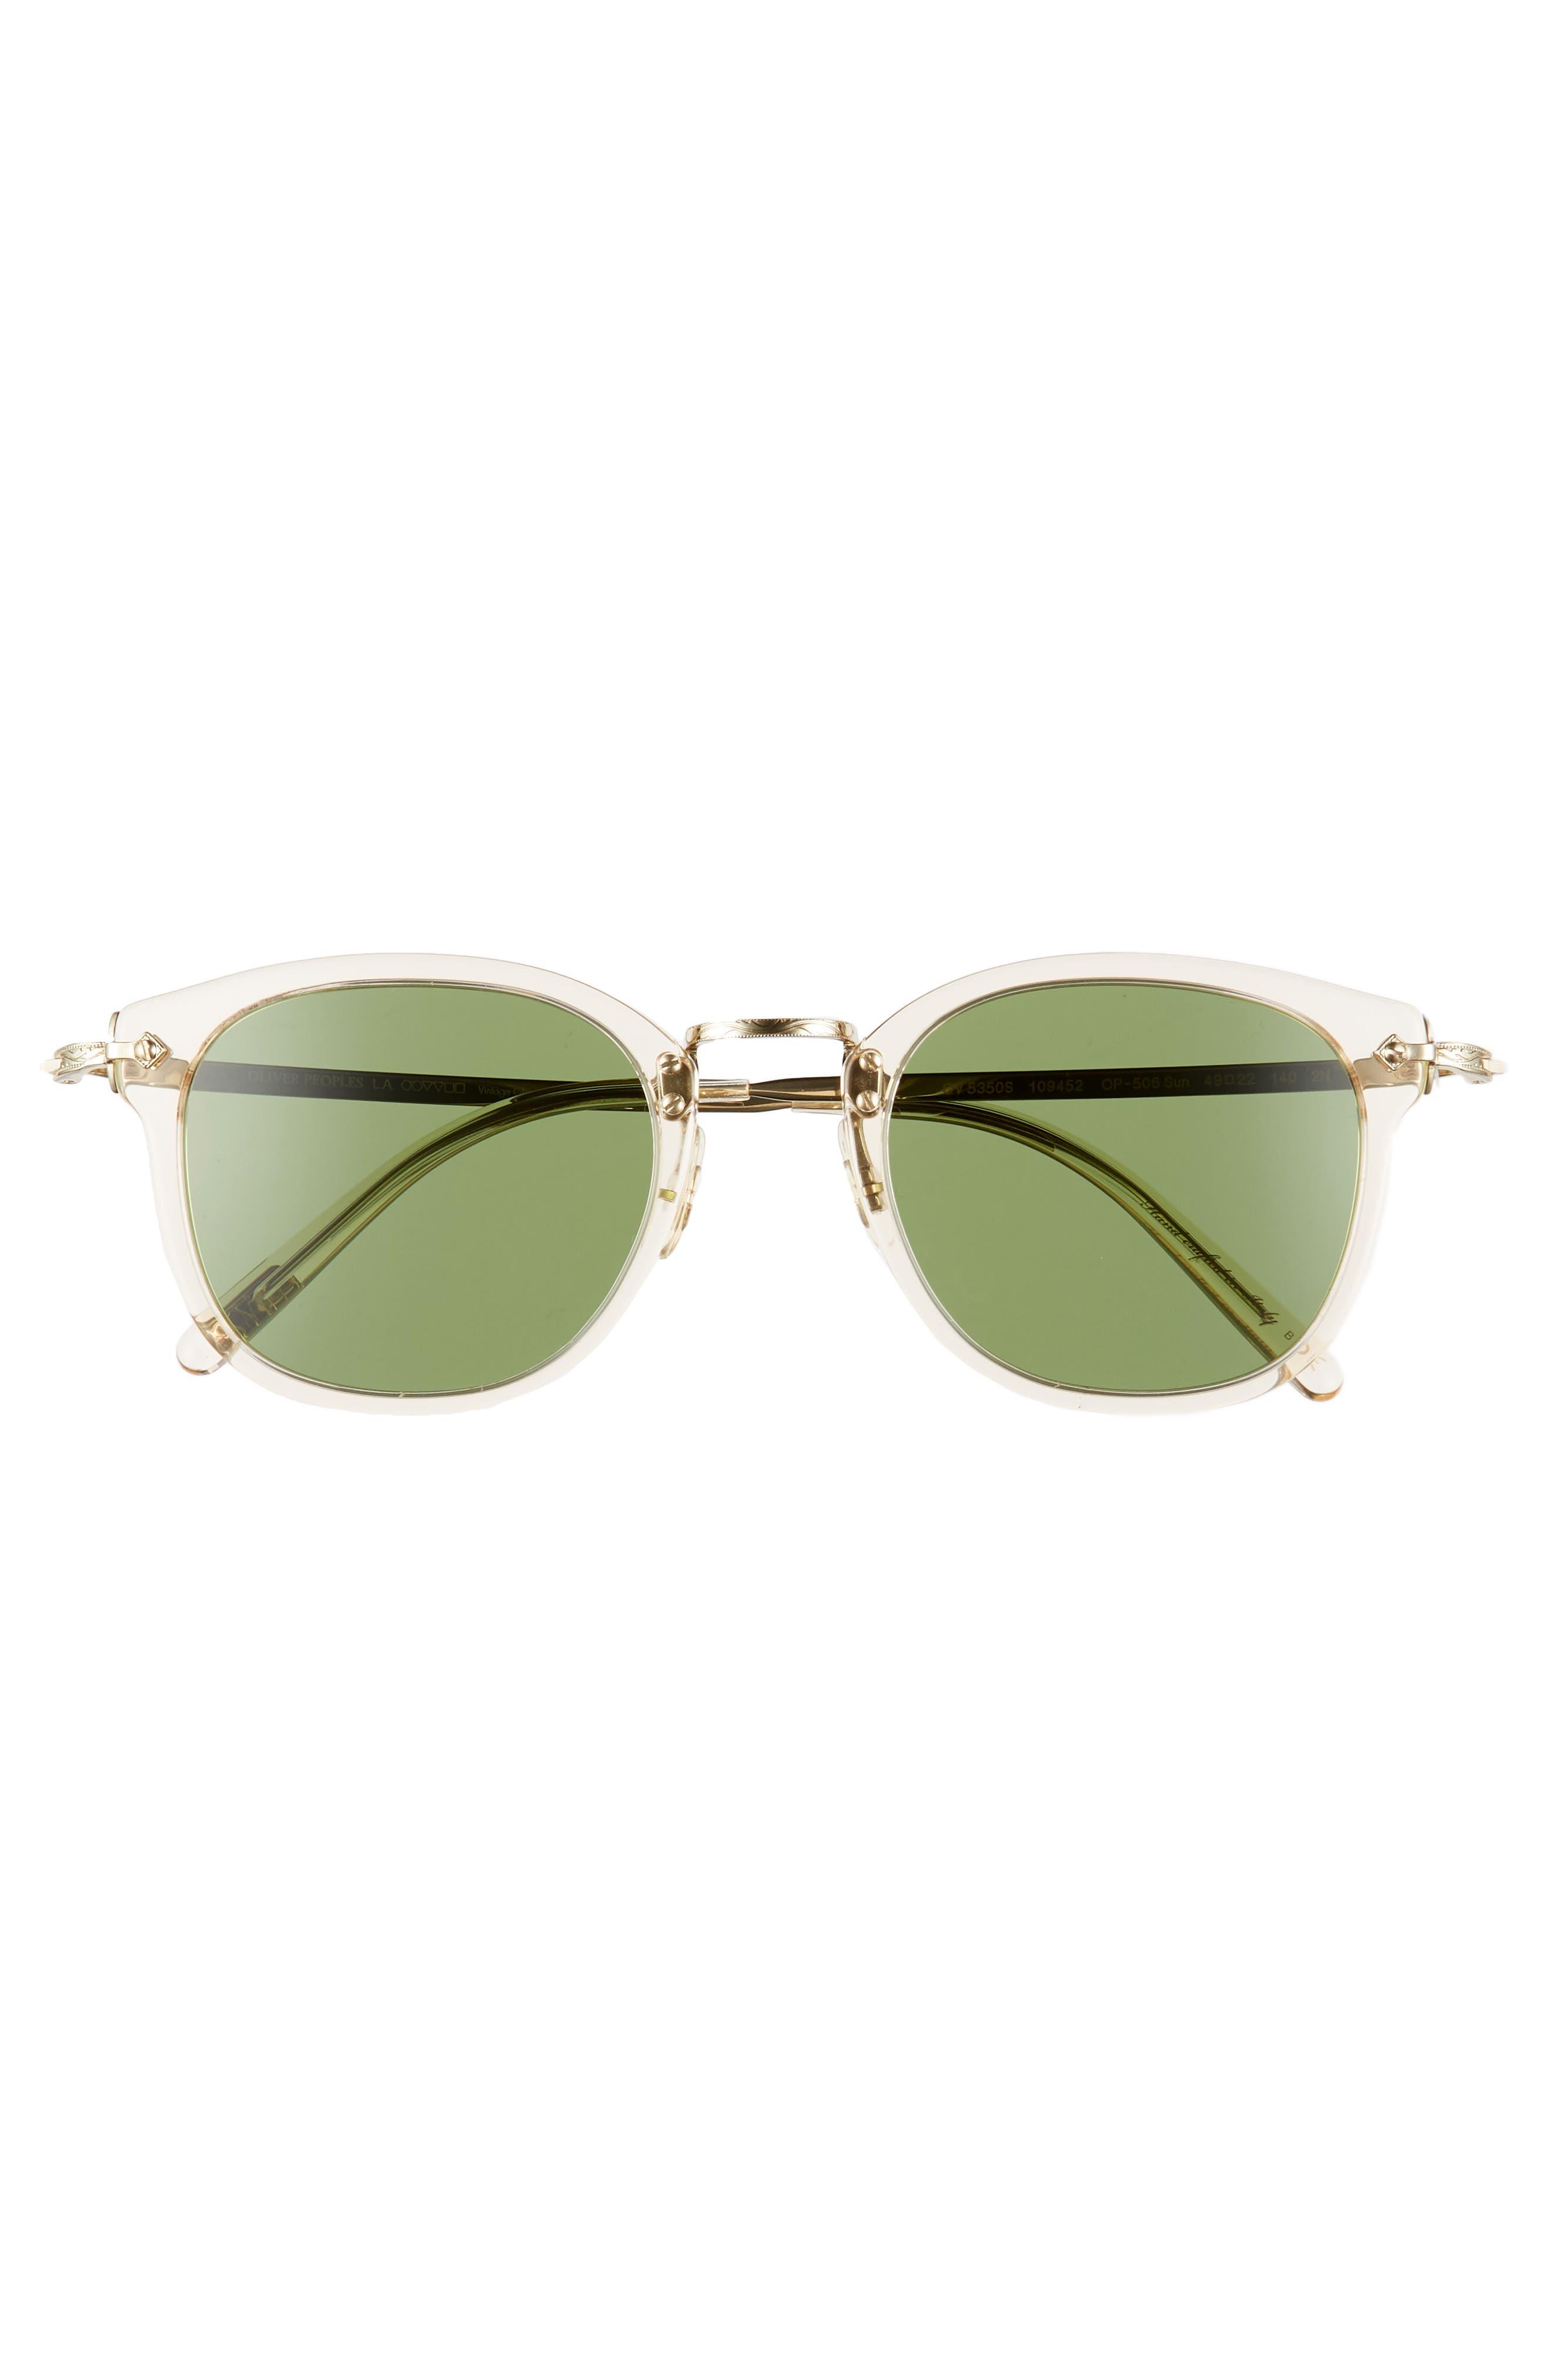 e8e9912f2533 Men s Oliver Peoples Sunglasses   Eyeglasses